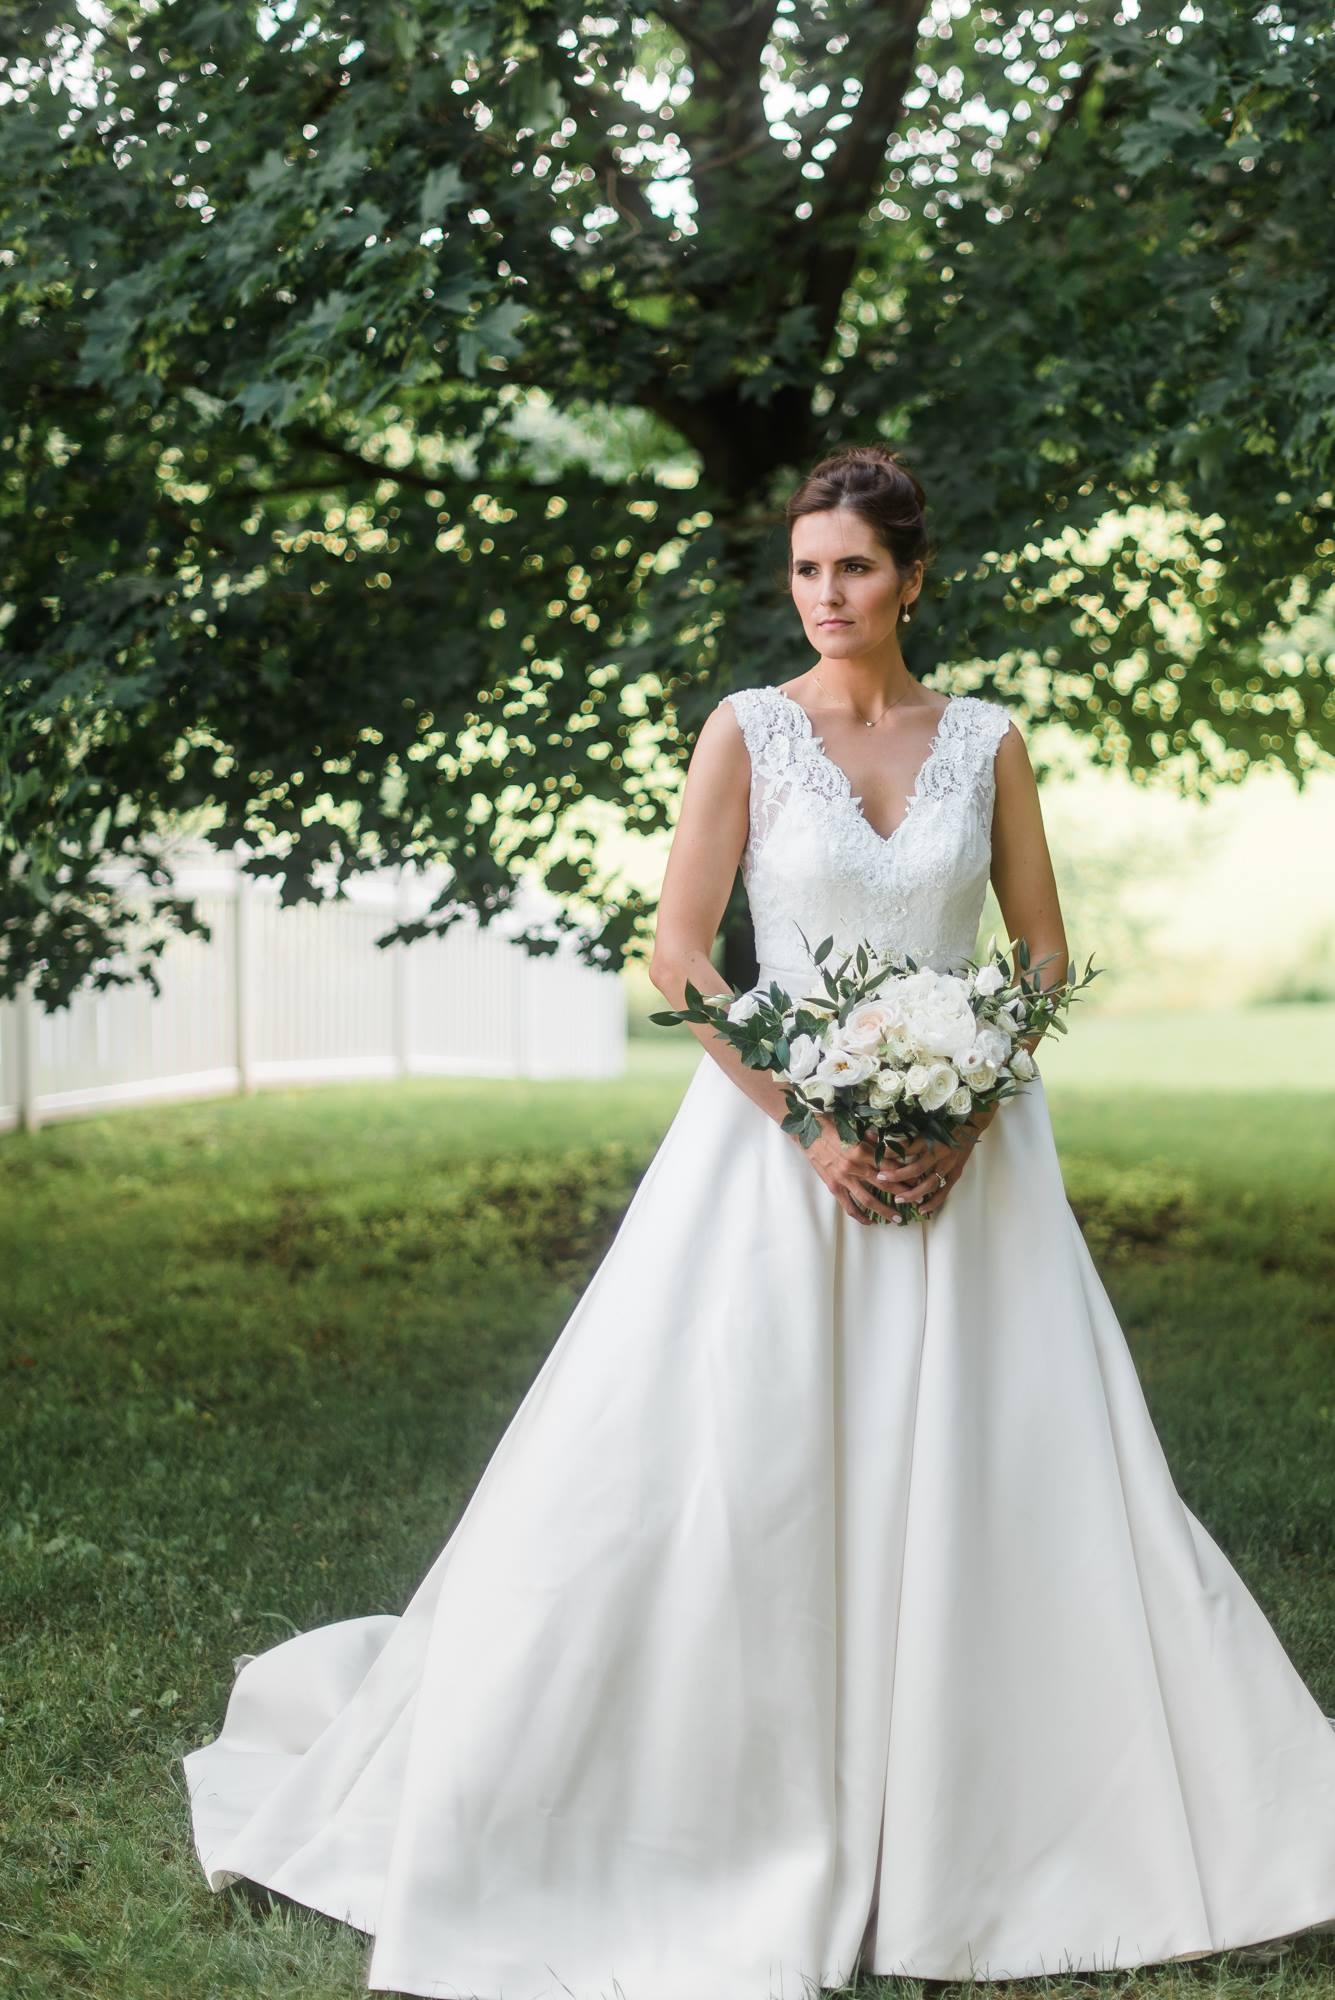 pittsburgh-pennsylvania-backyard-glam-chic-modern-classic-wedding-0015.jpg